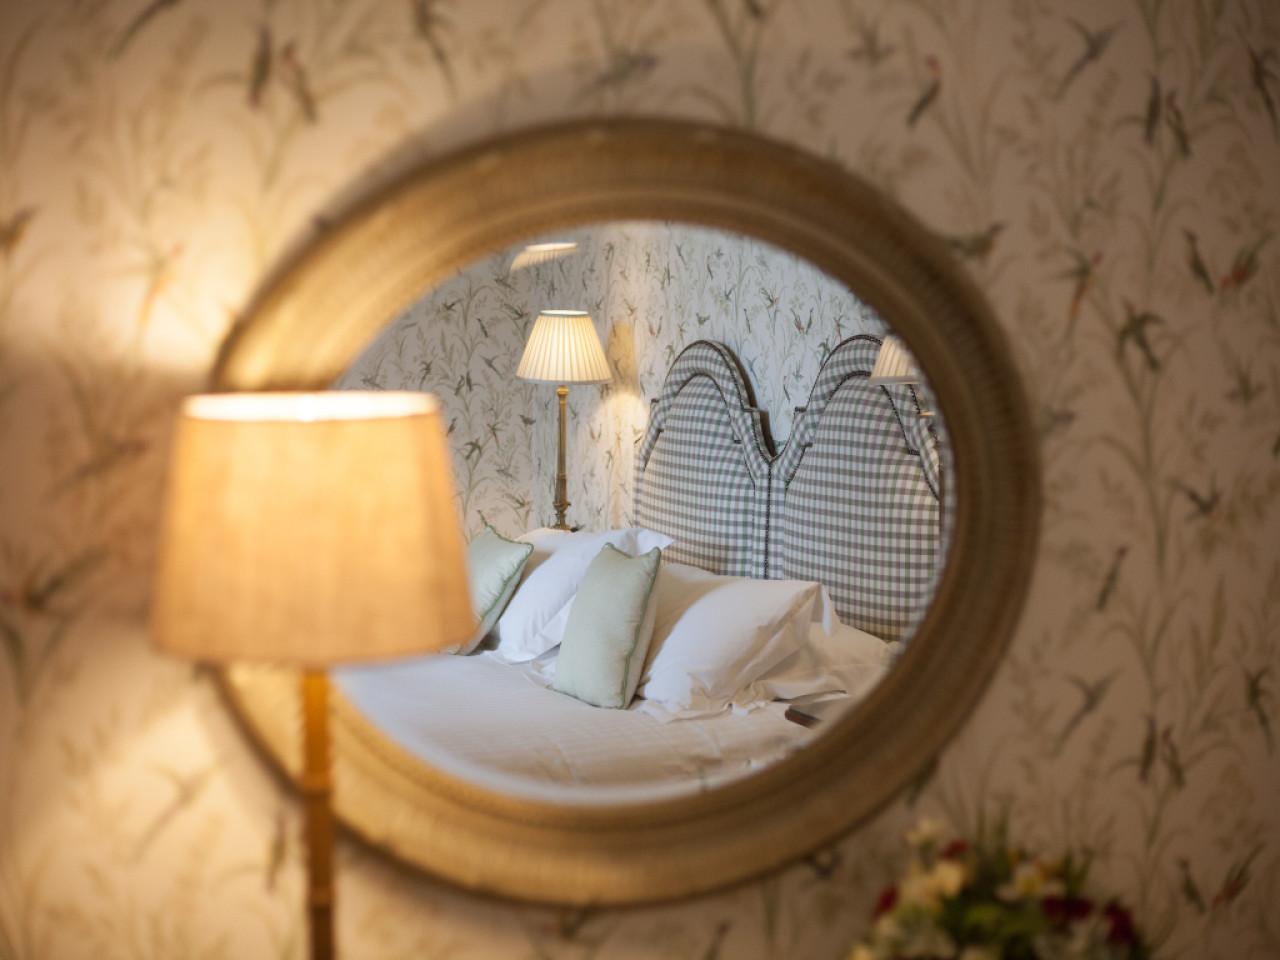 Stay at Abbotsford, Sophia bedroom